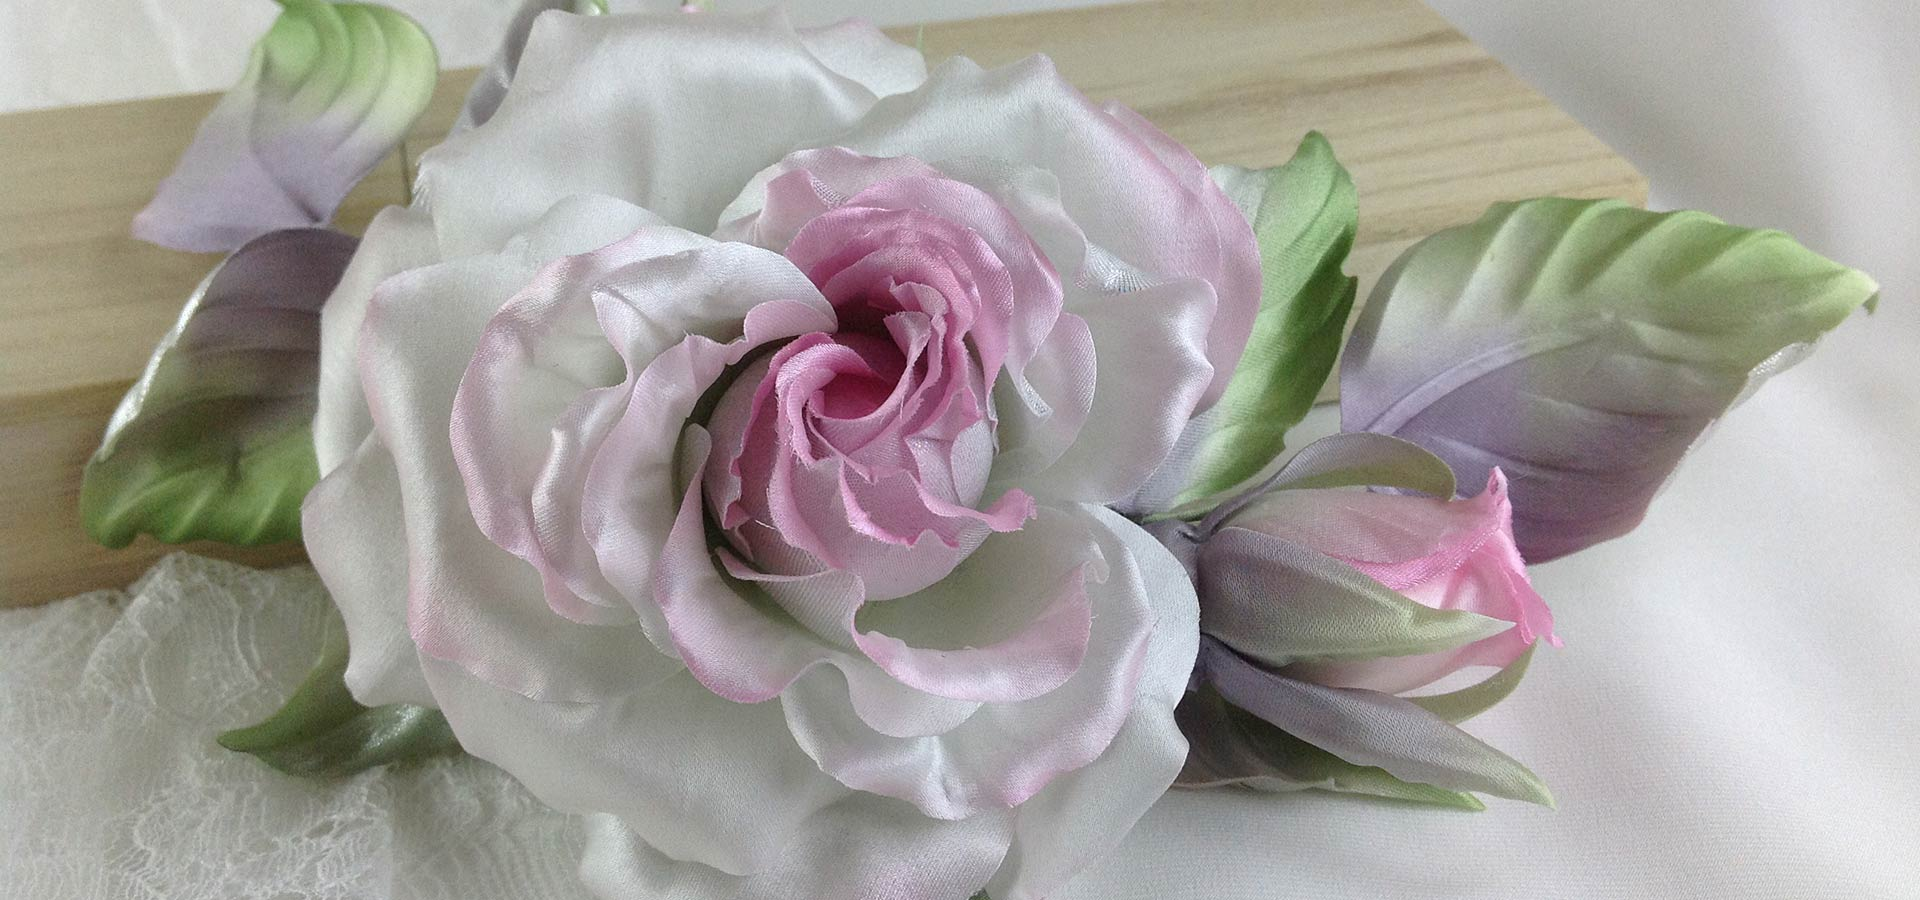 kfr1-silk-rose-Alexandra